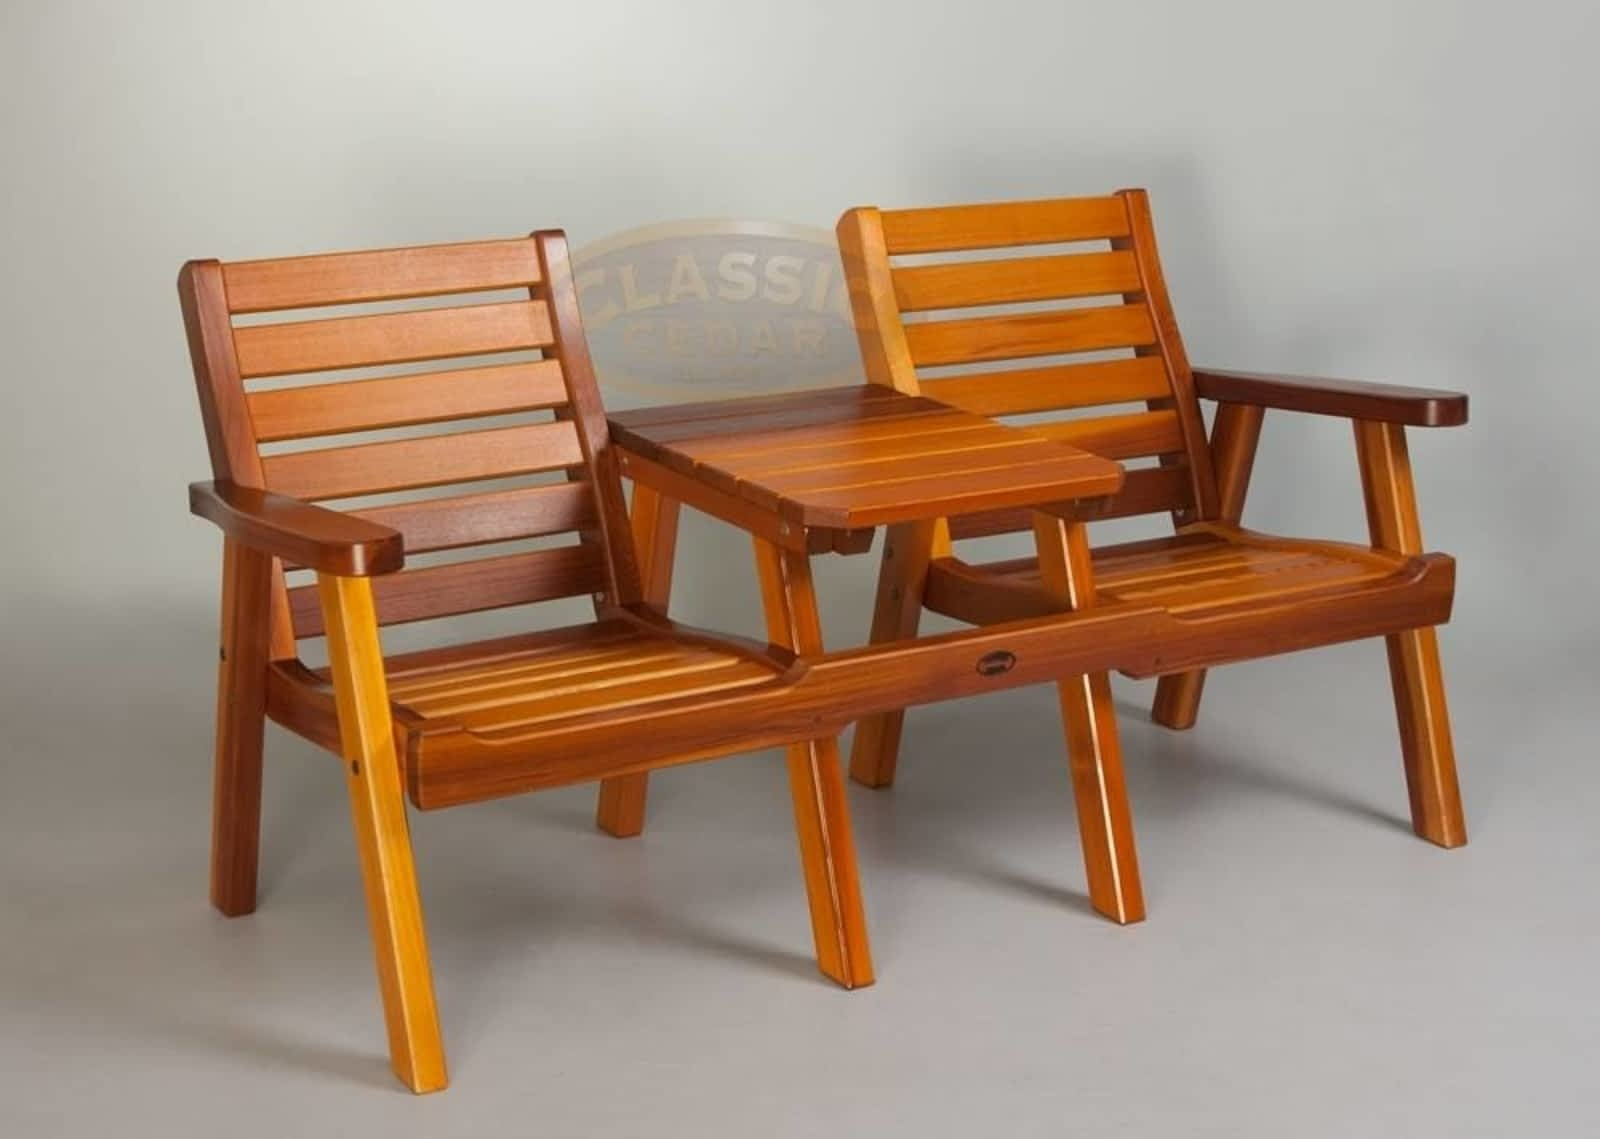 Classic Cedar Garden Furniture & Gazebos - Opening Hours - 4559 ...